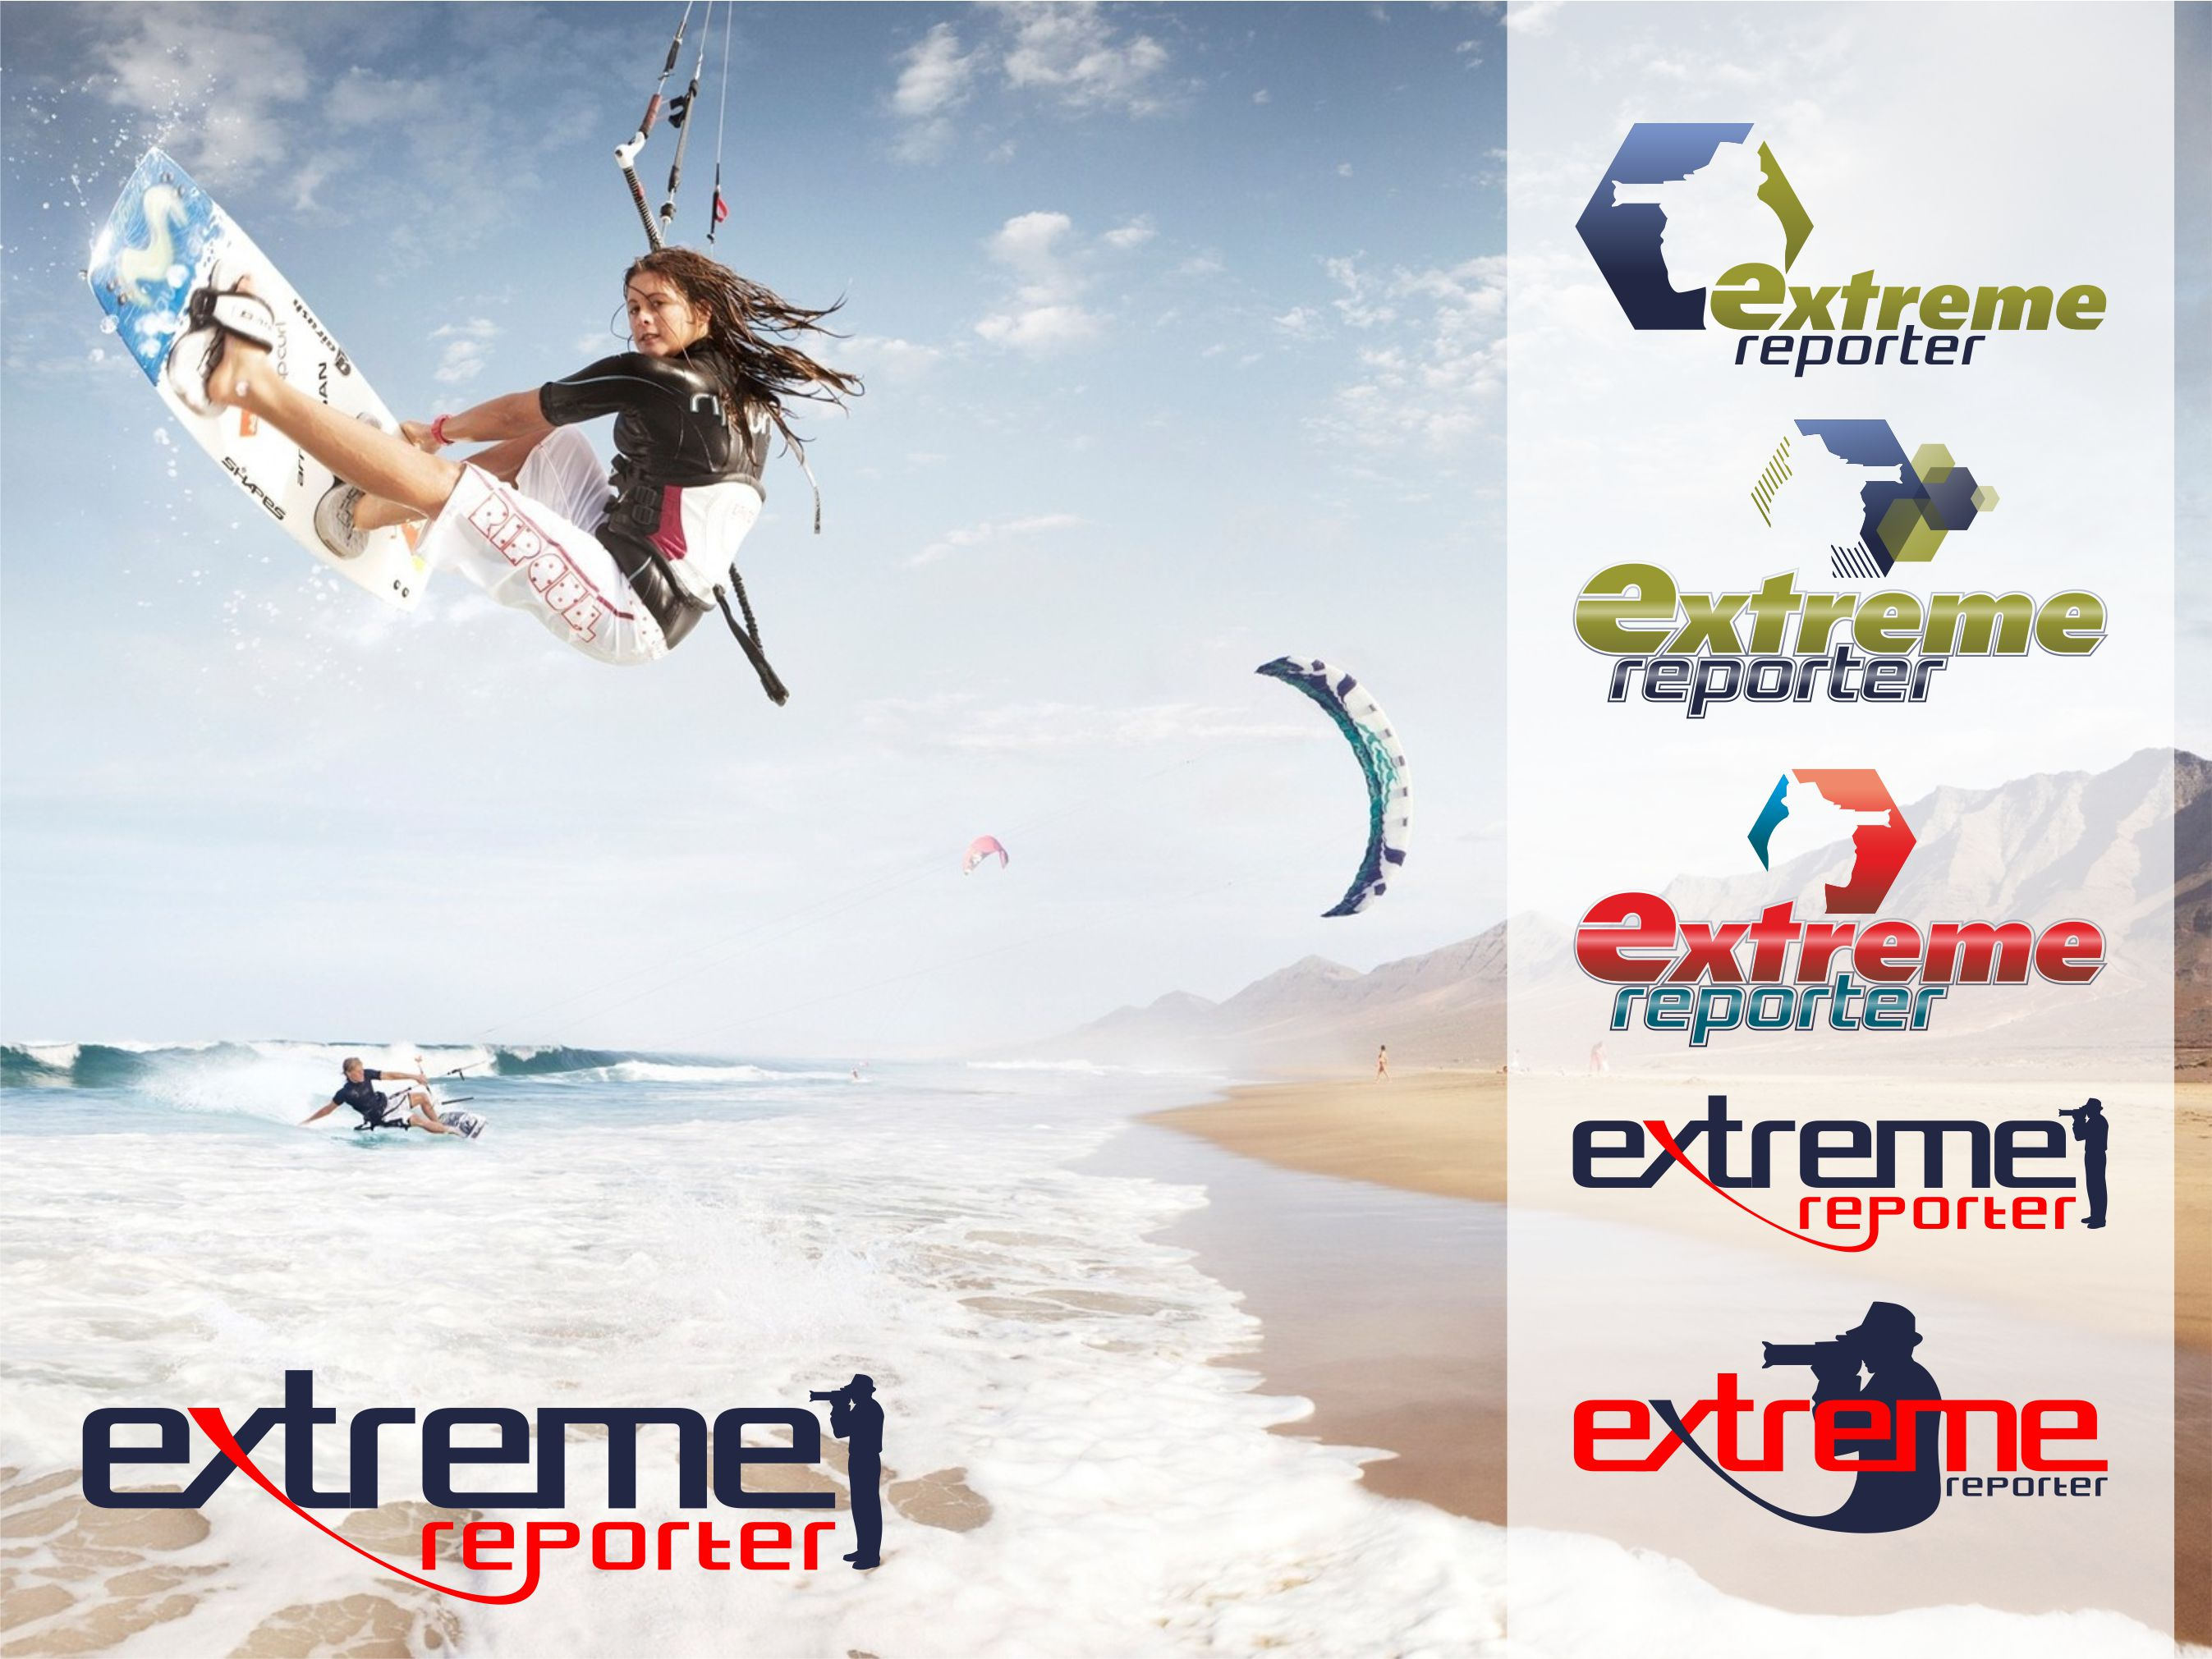 Логотип для экстрим фотографа.  фото f_5775a527b0118608.jpg